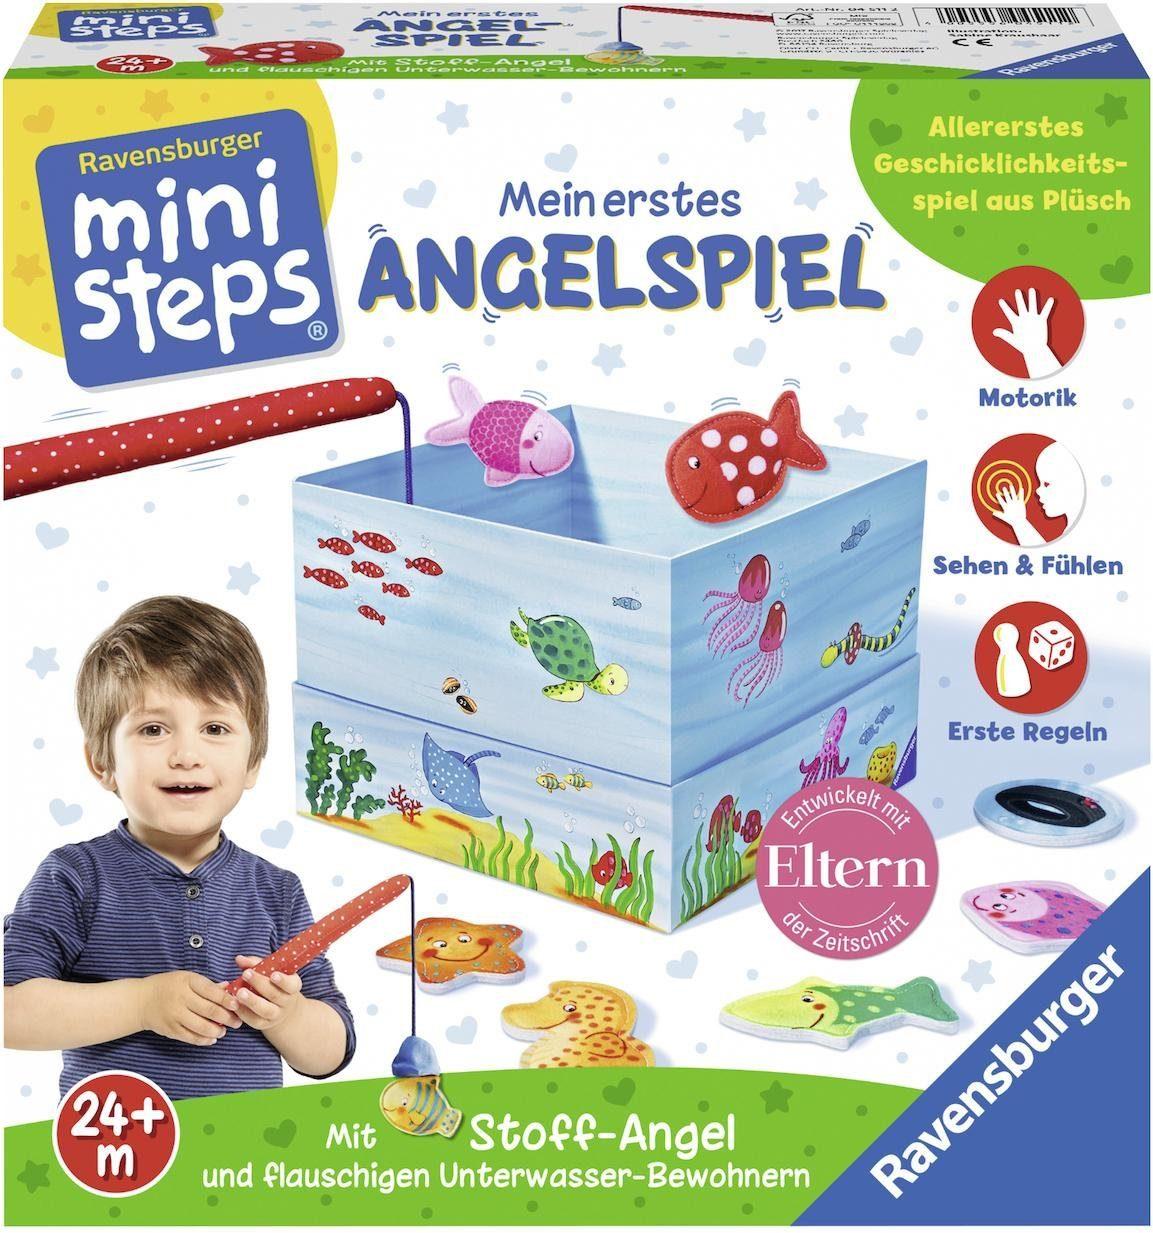 Ravensburger Kinderspiel, »Mein erstes Angelspiel«